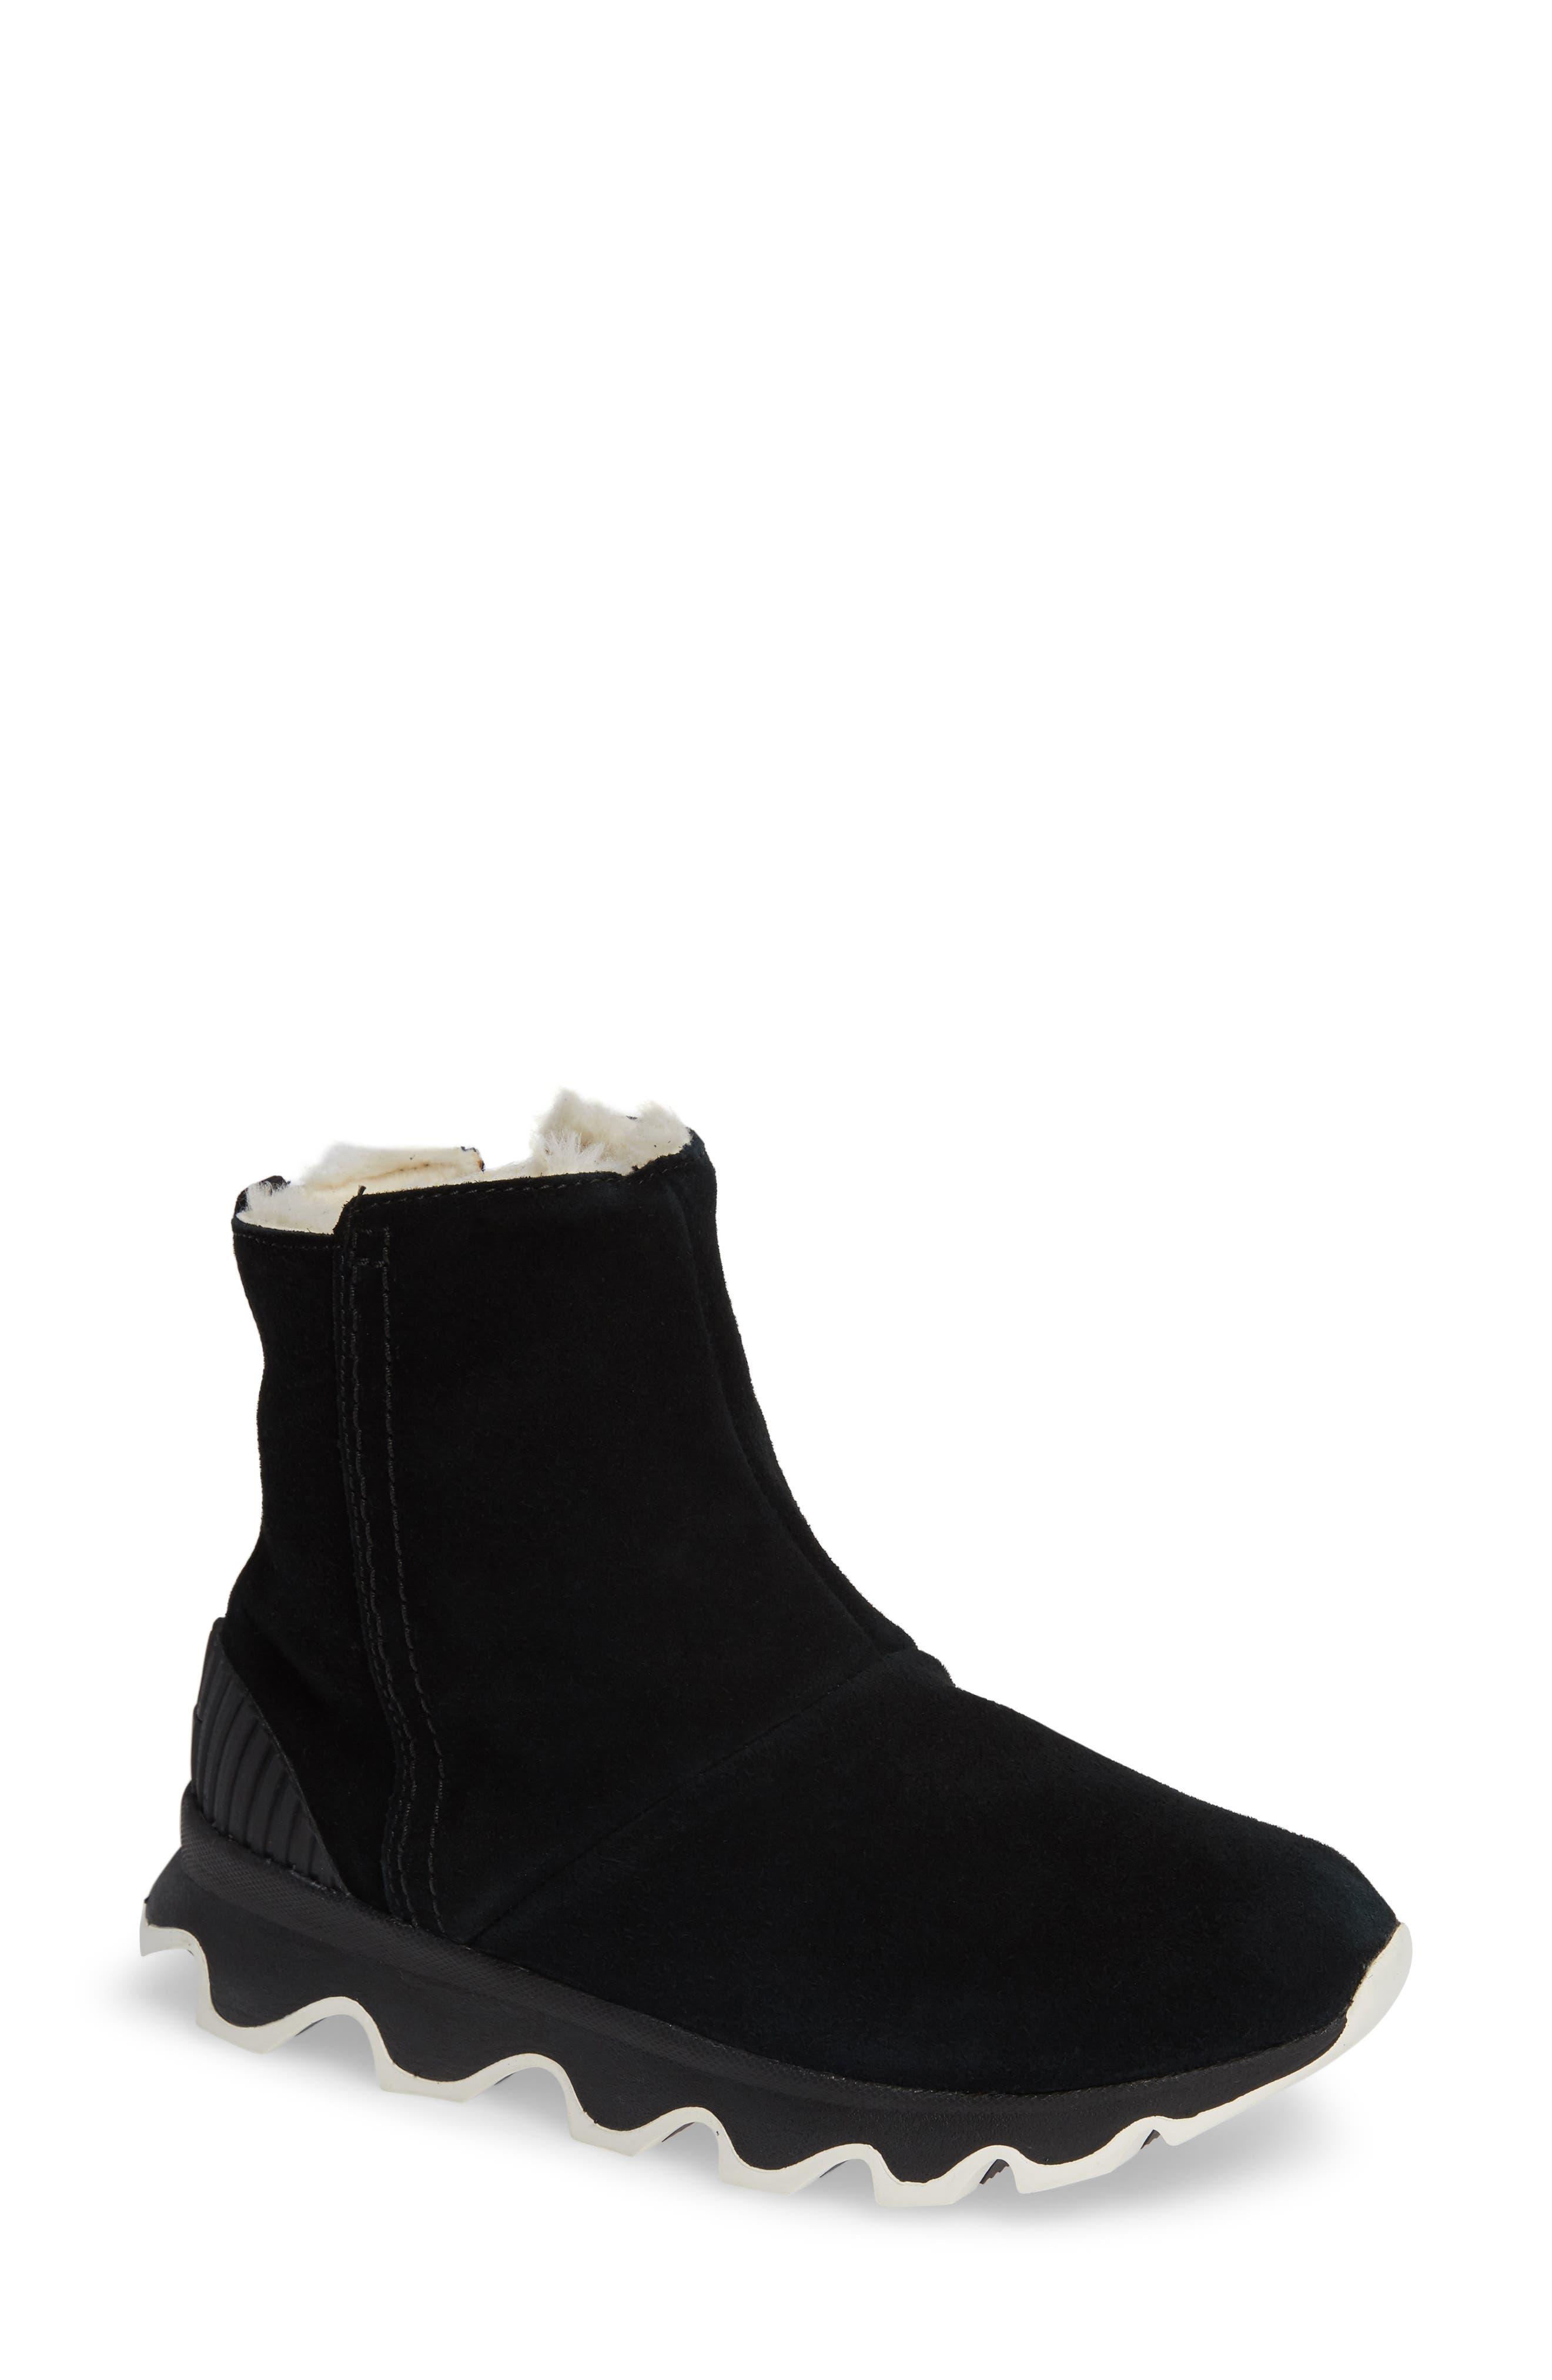 Kinetic Insulated Waterproof Short Boots,                         Main,                         color, BLACK/ SEA SALT